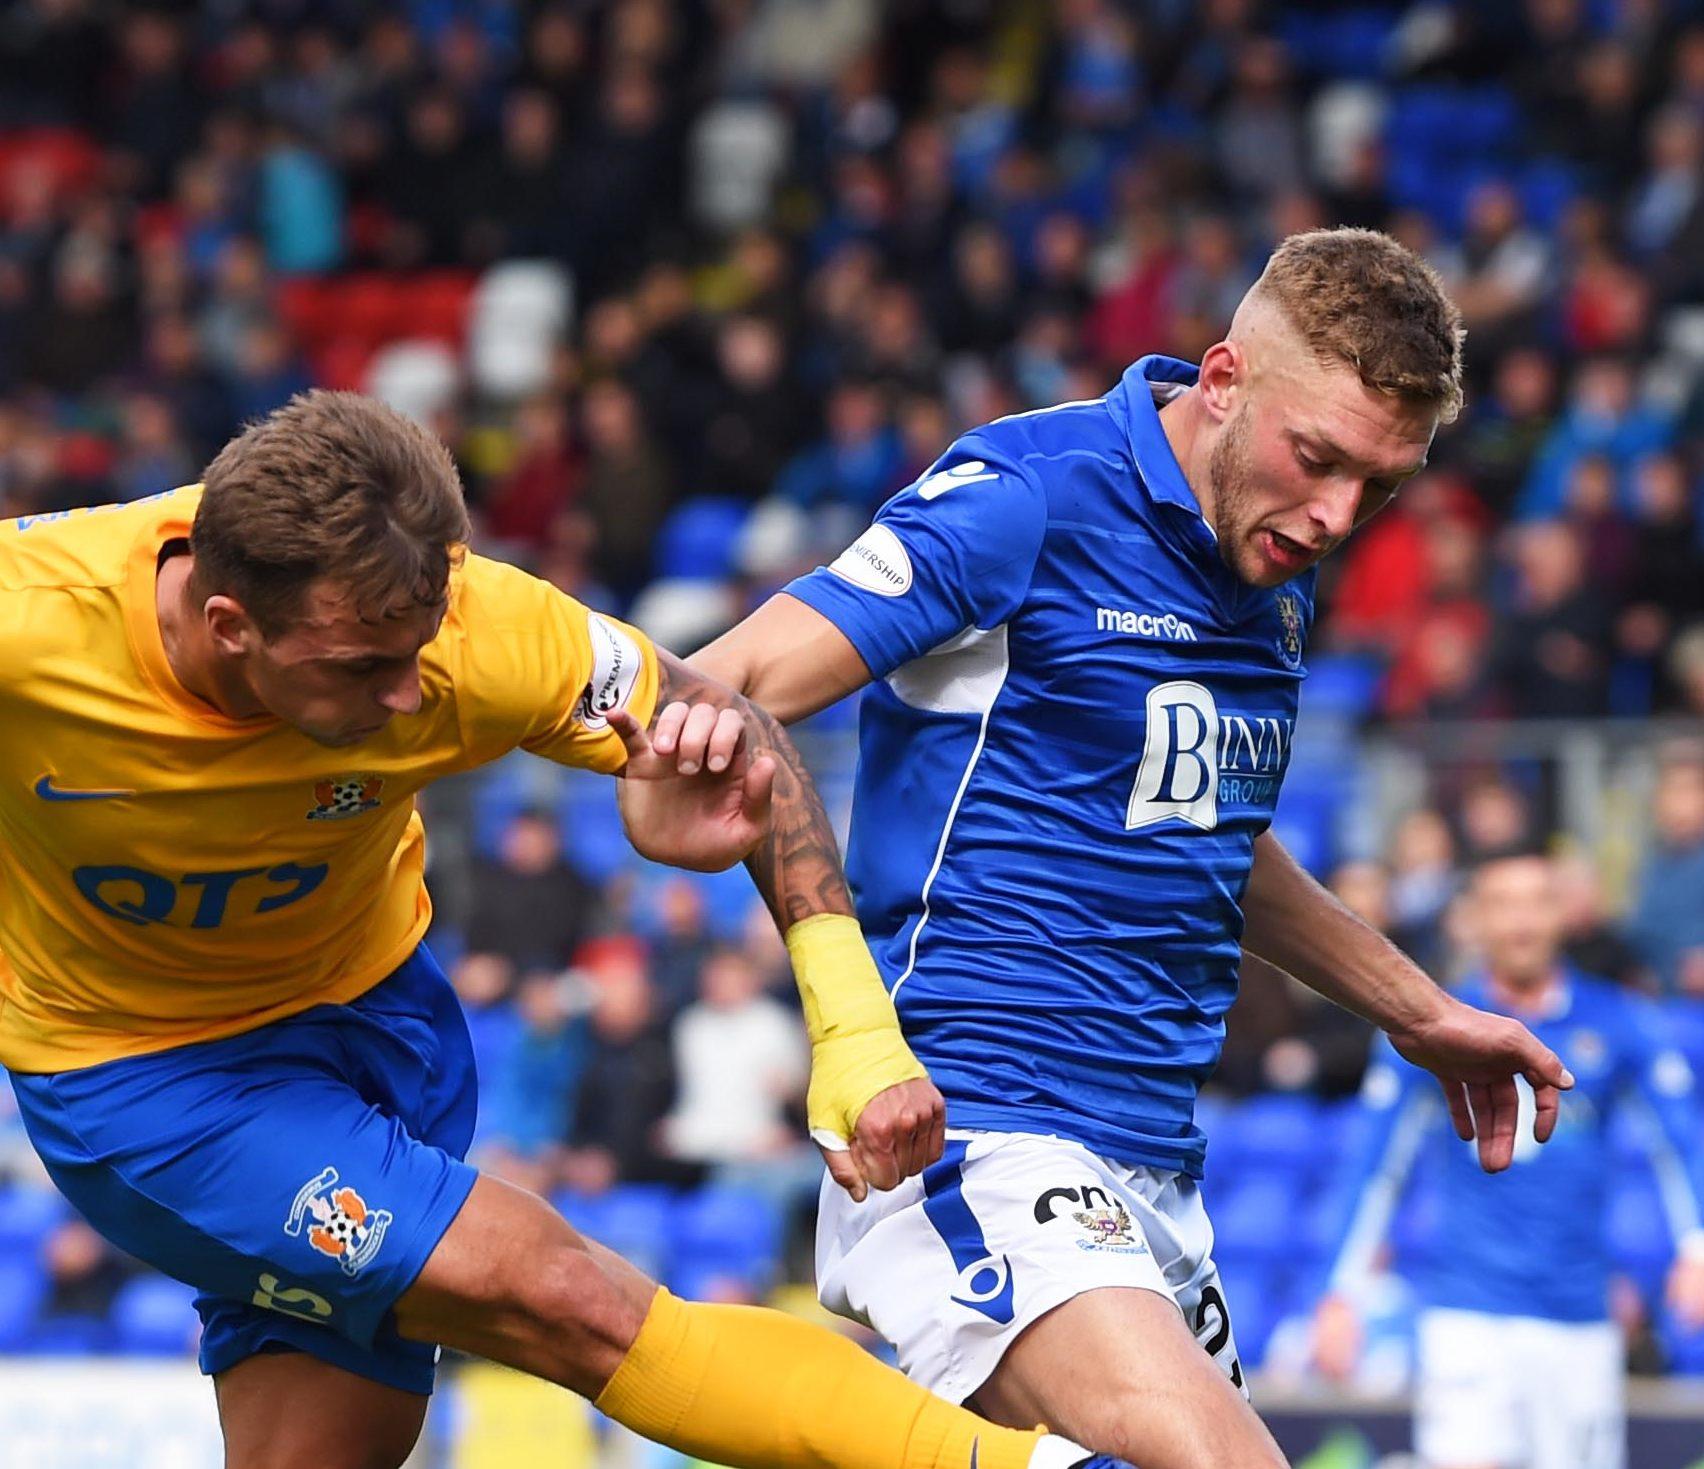 Liam Gordon in action against St Johnstone.